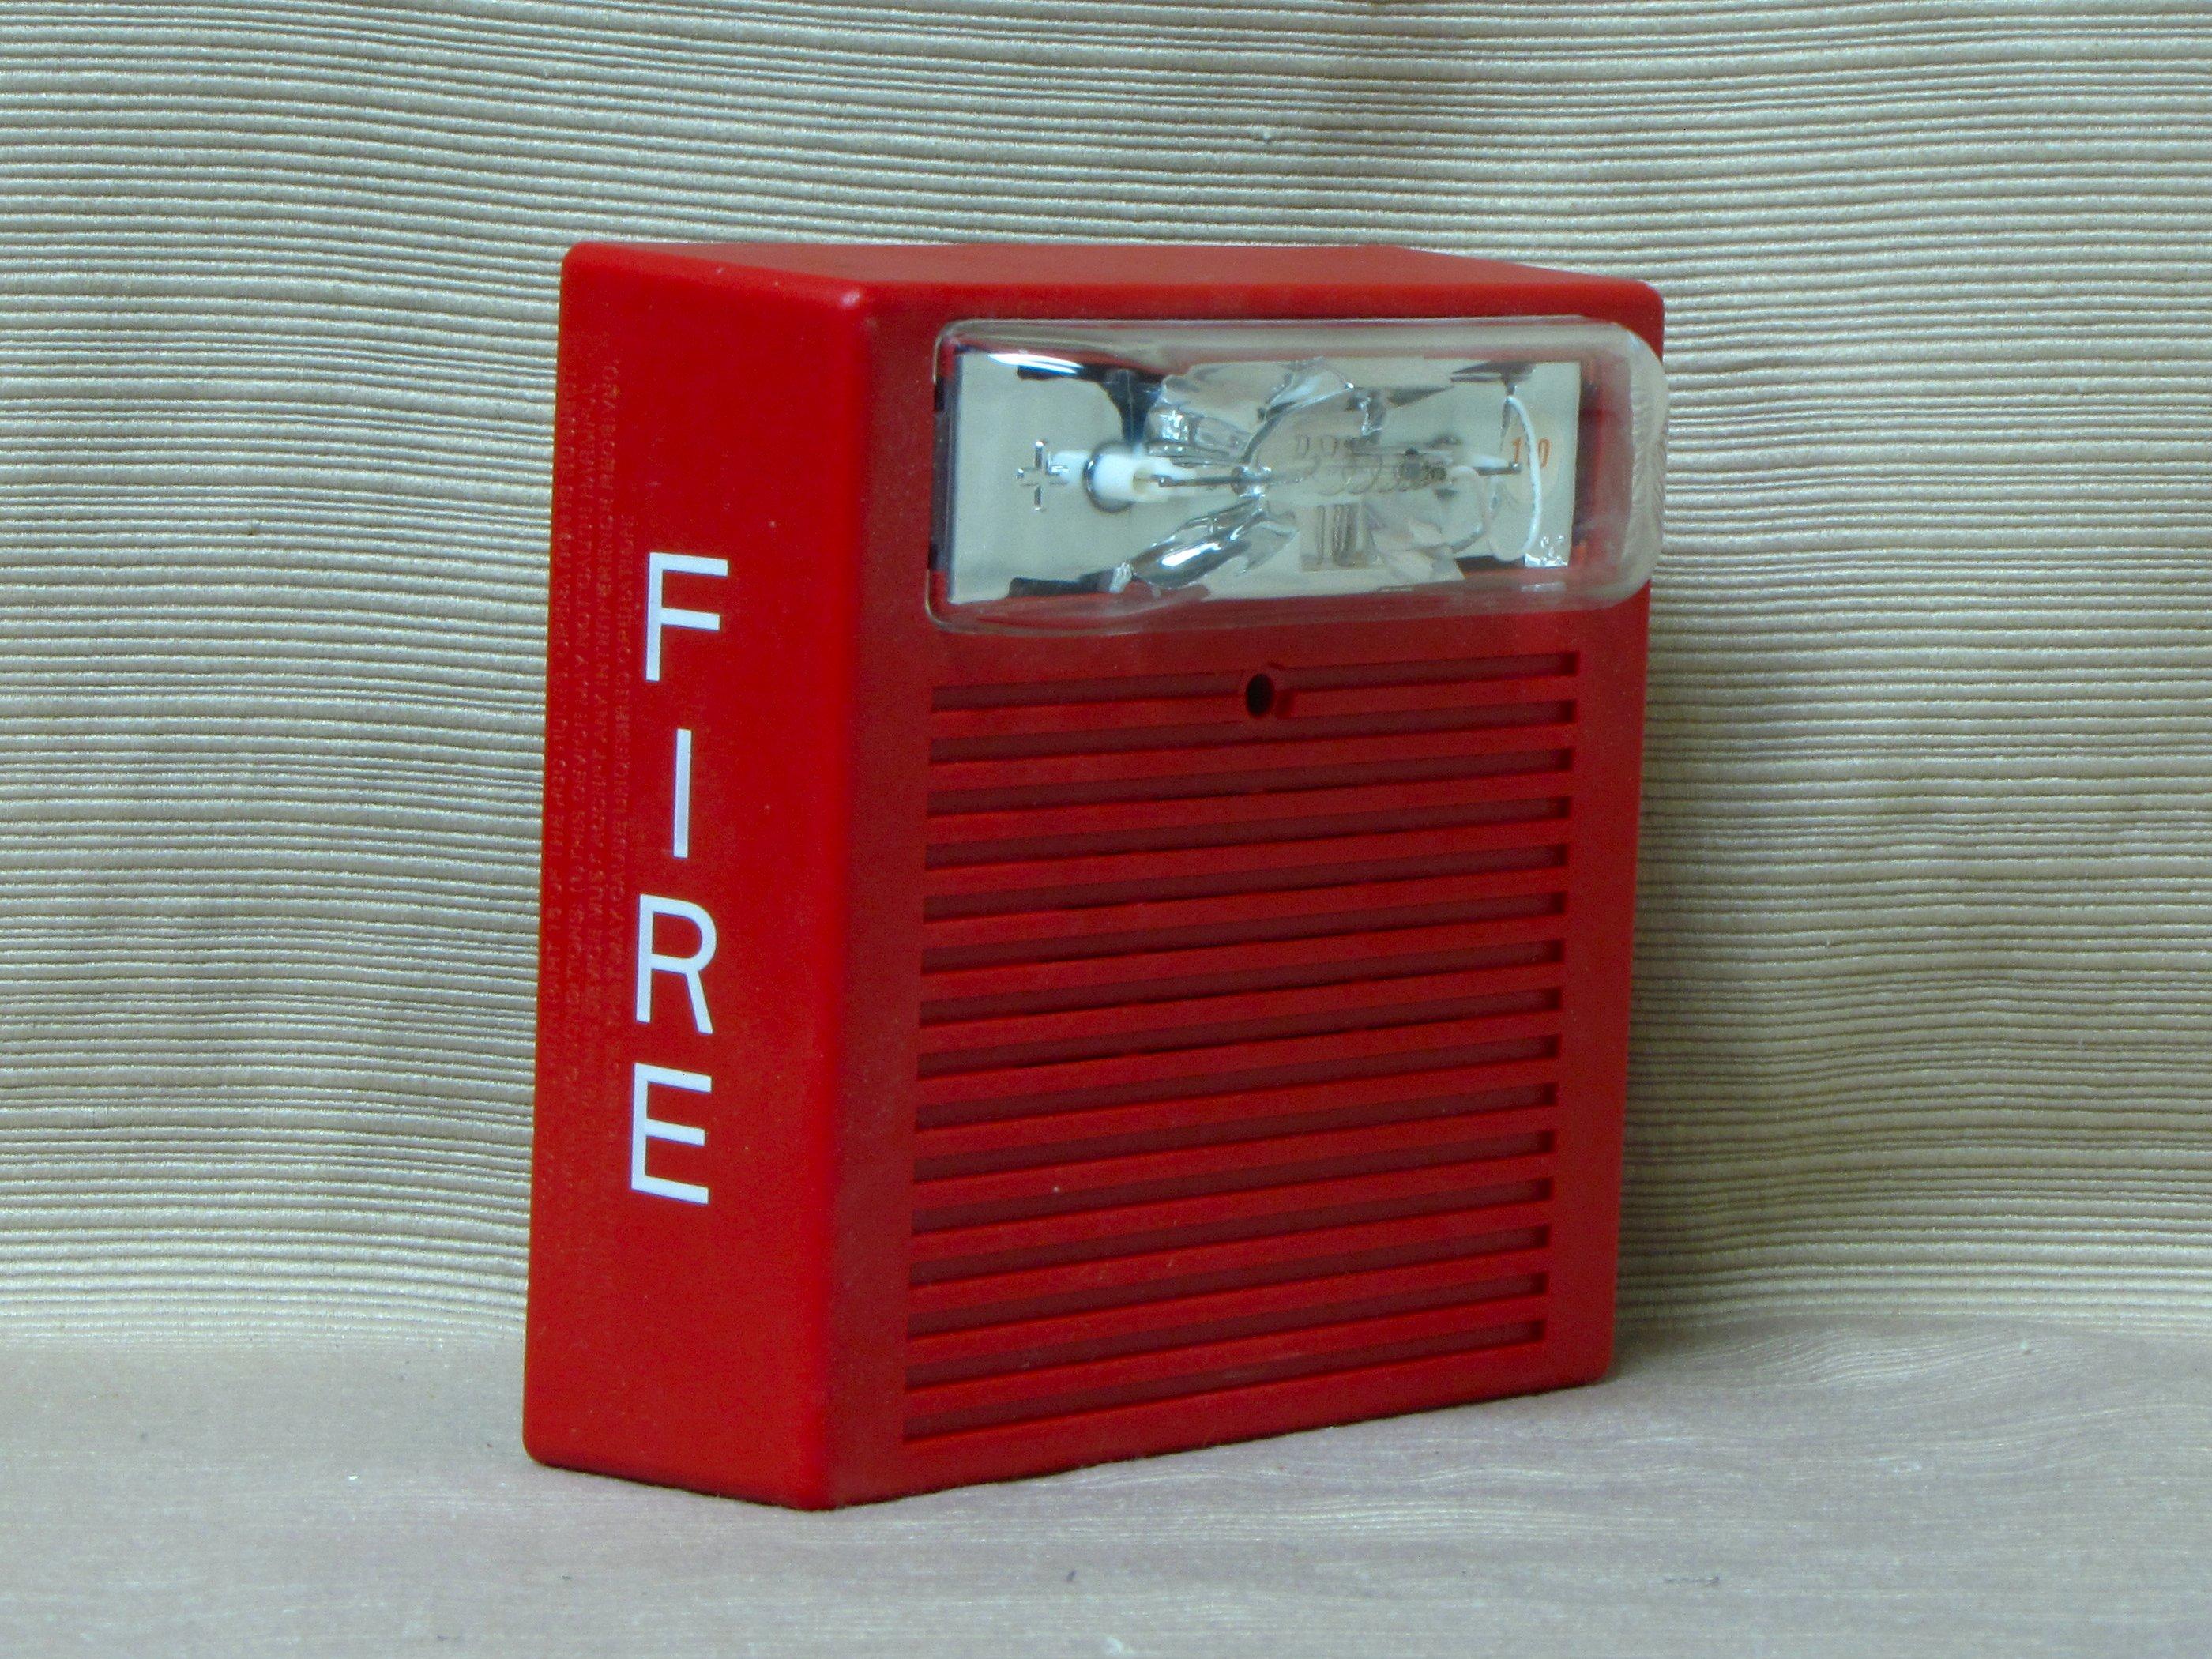 Sensor Fire Alarm Sound : The schumin web wheelock as w